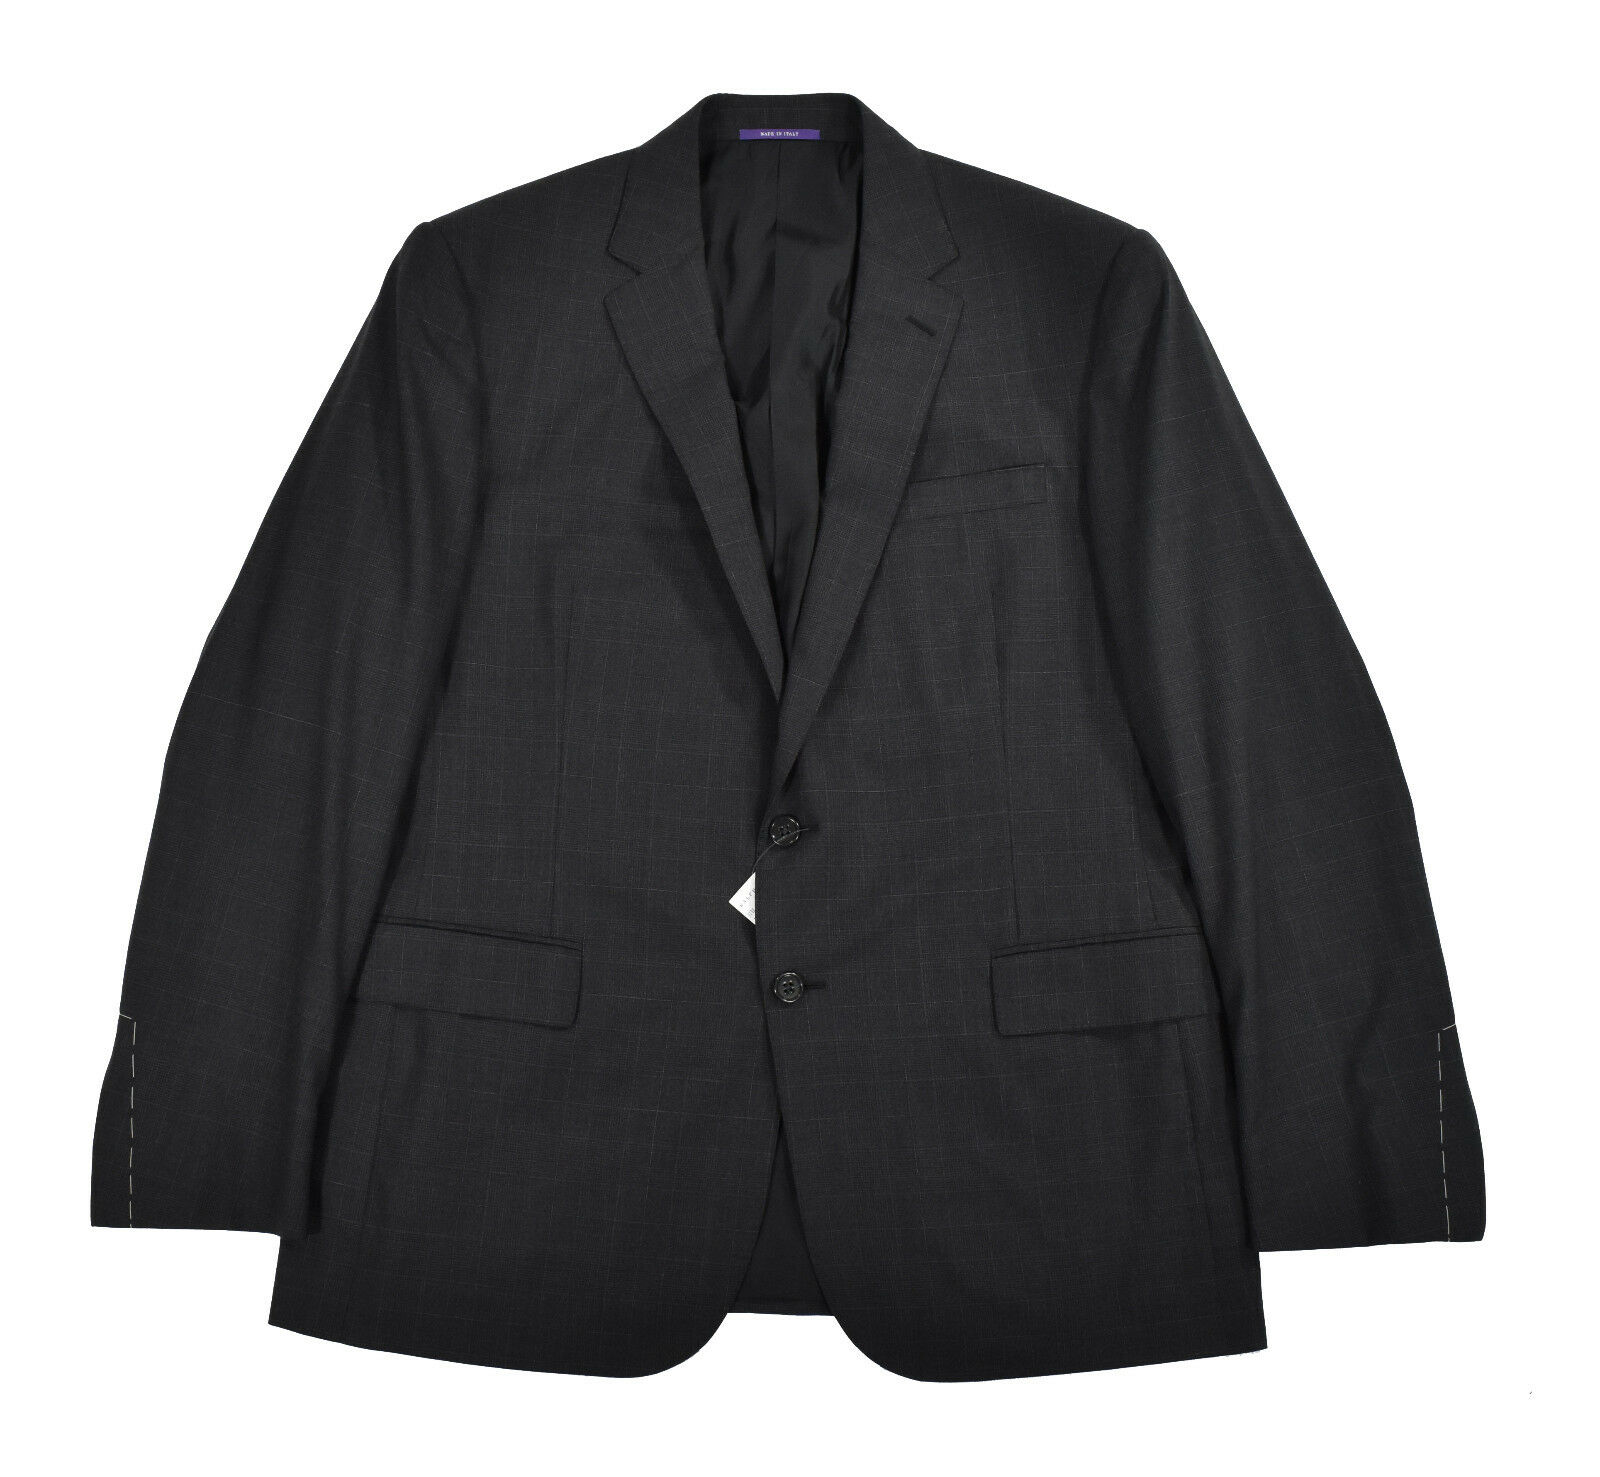 Ralph Lauren lila Label Anthony Glen Plaid Wool Suit 44 R New 2795